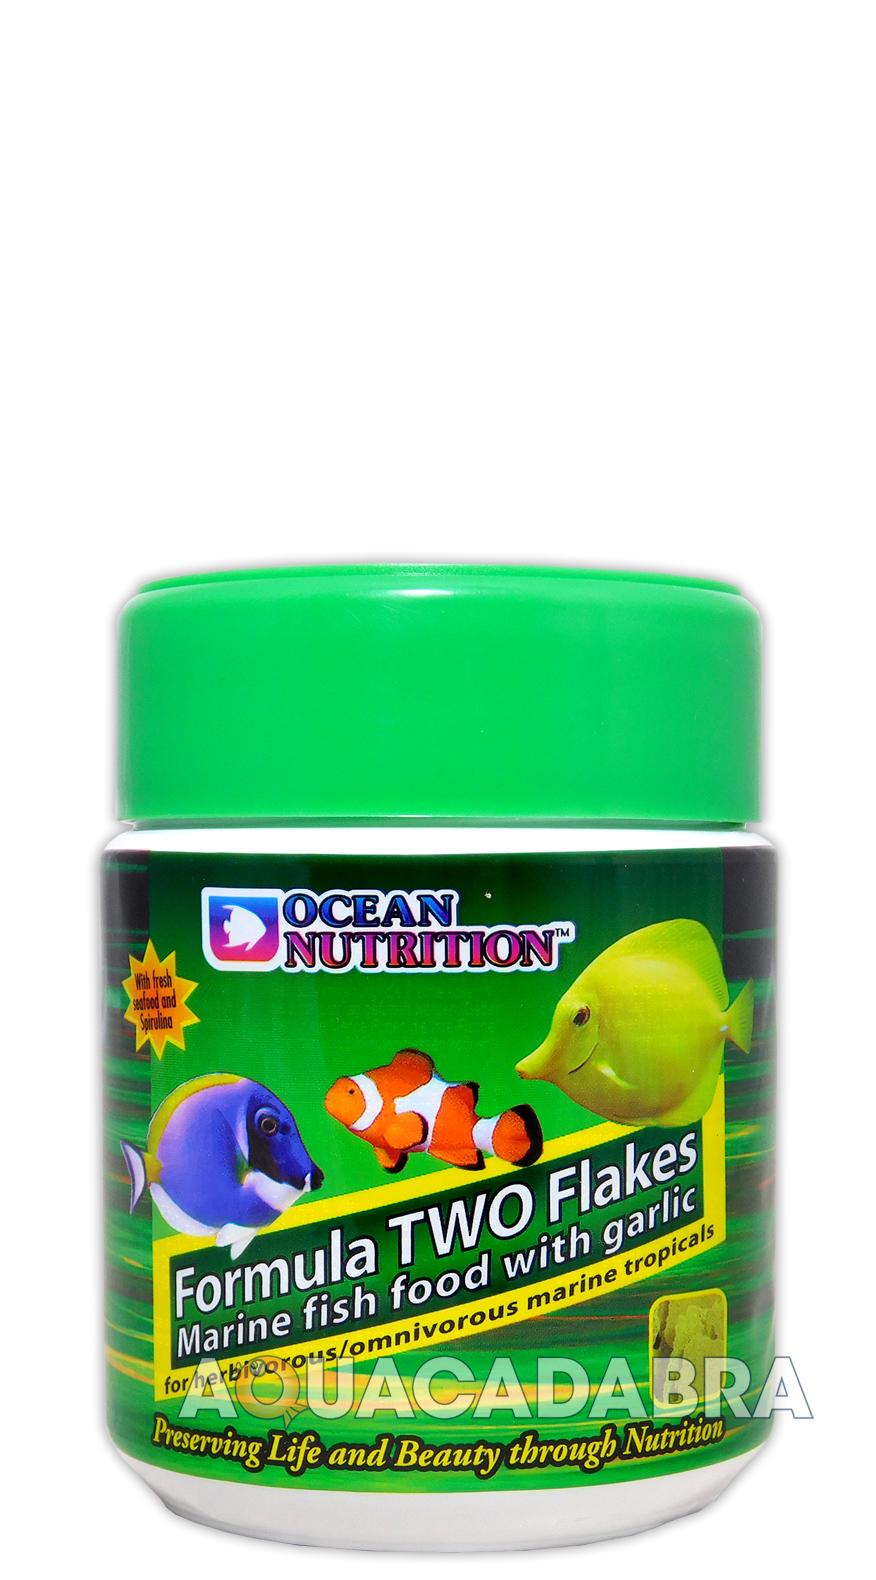 Ocean nutrition formula two marine flake herbivore fish for Saltwater fish food